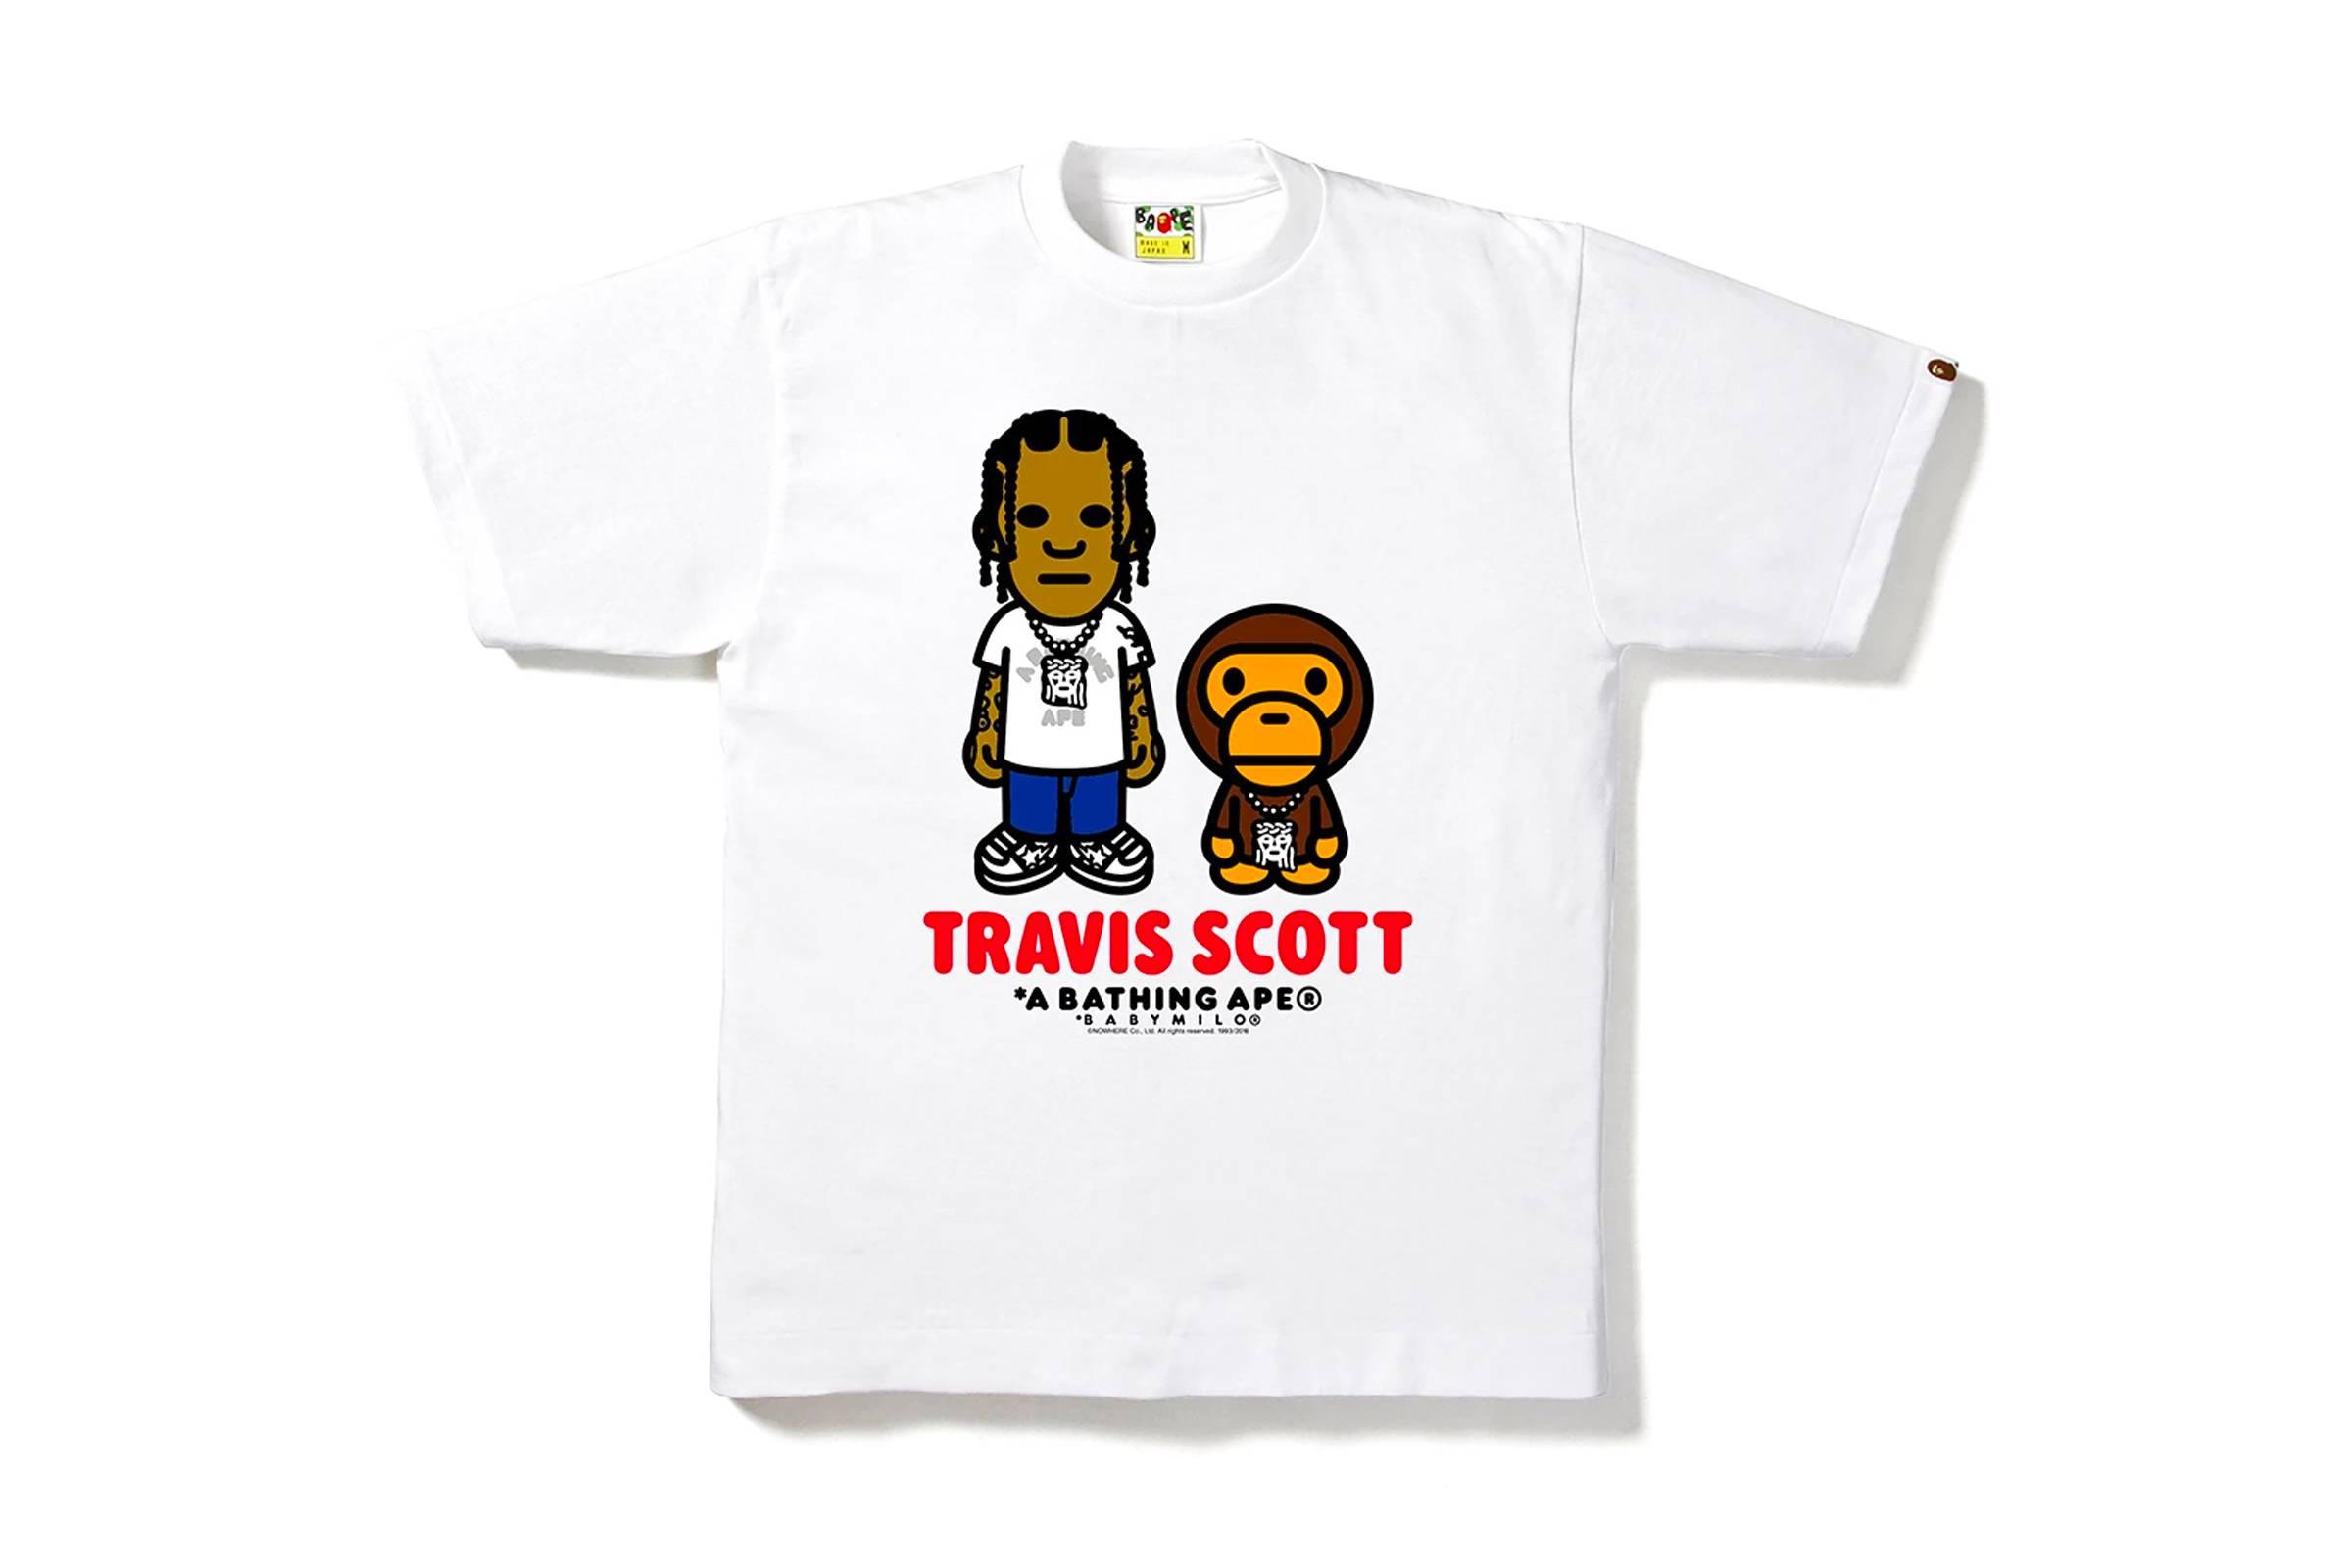 BAPE T-Shirt Collection (2016)